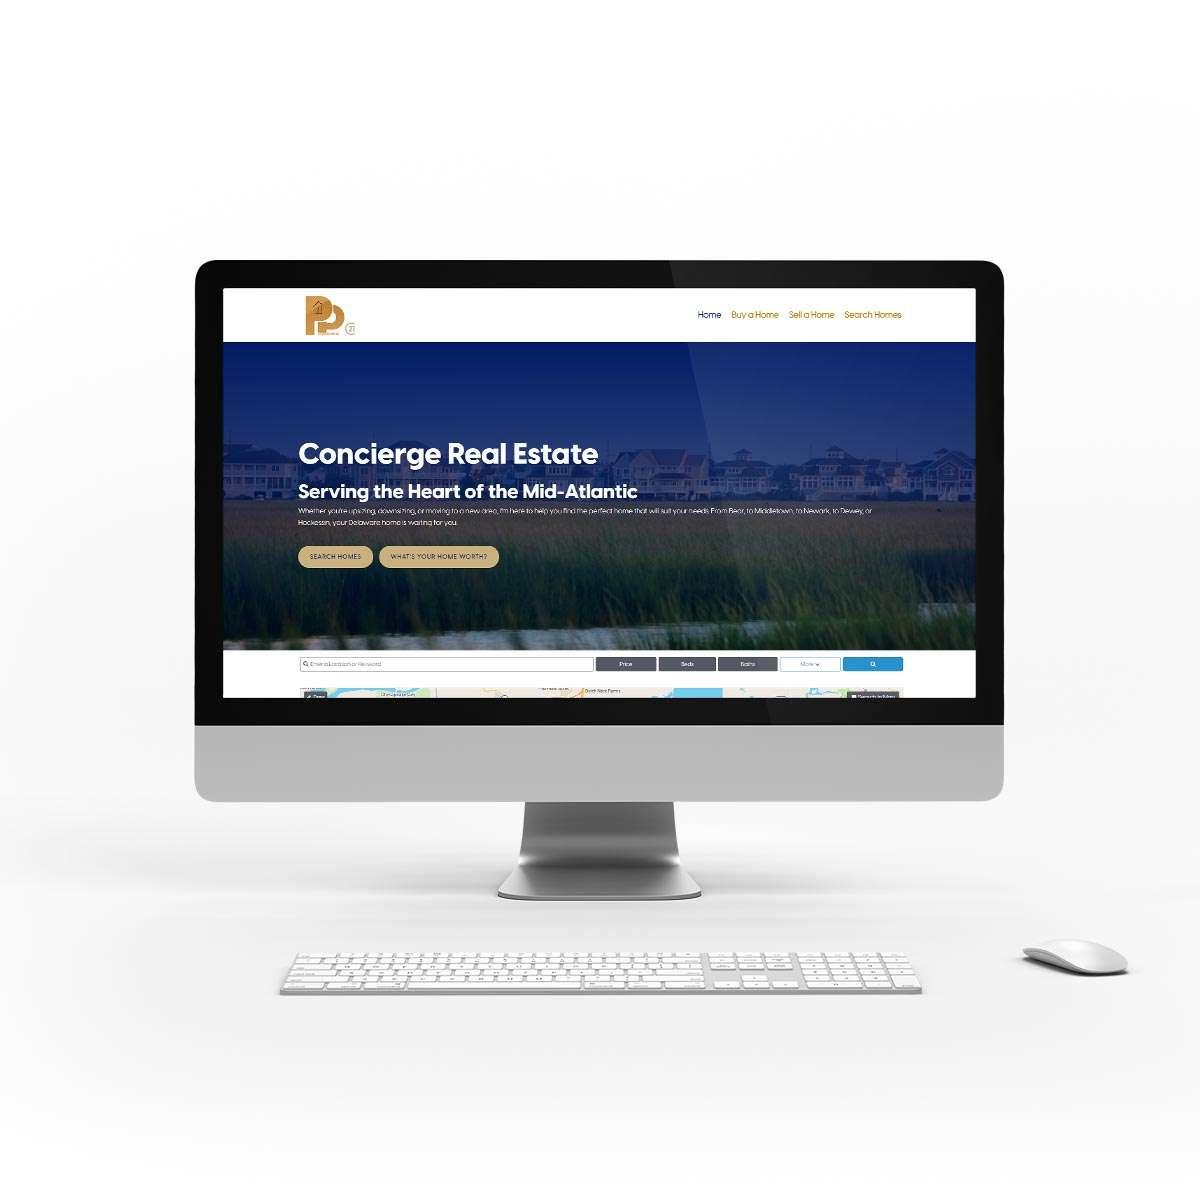 Real estate website design by BrandSwan, a Delaware branding agency